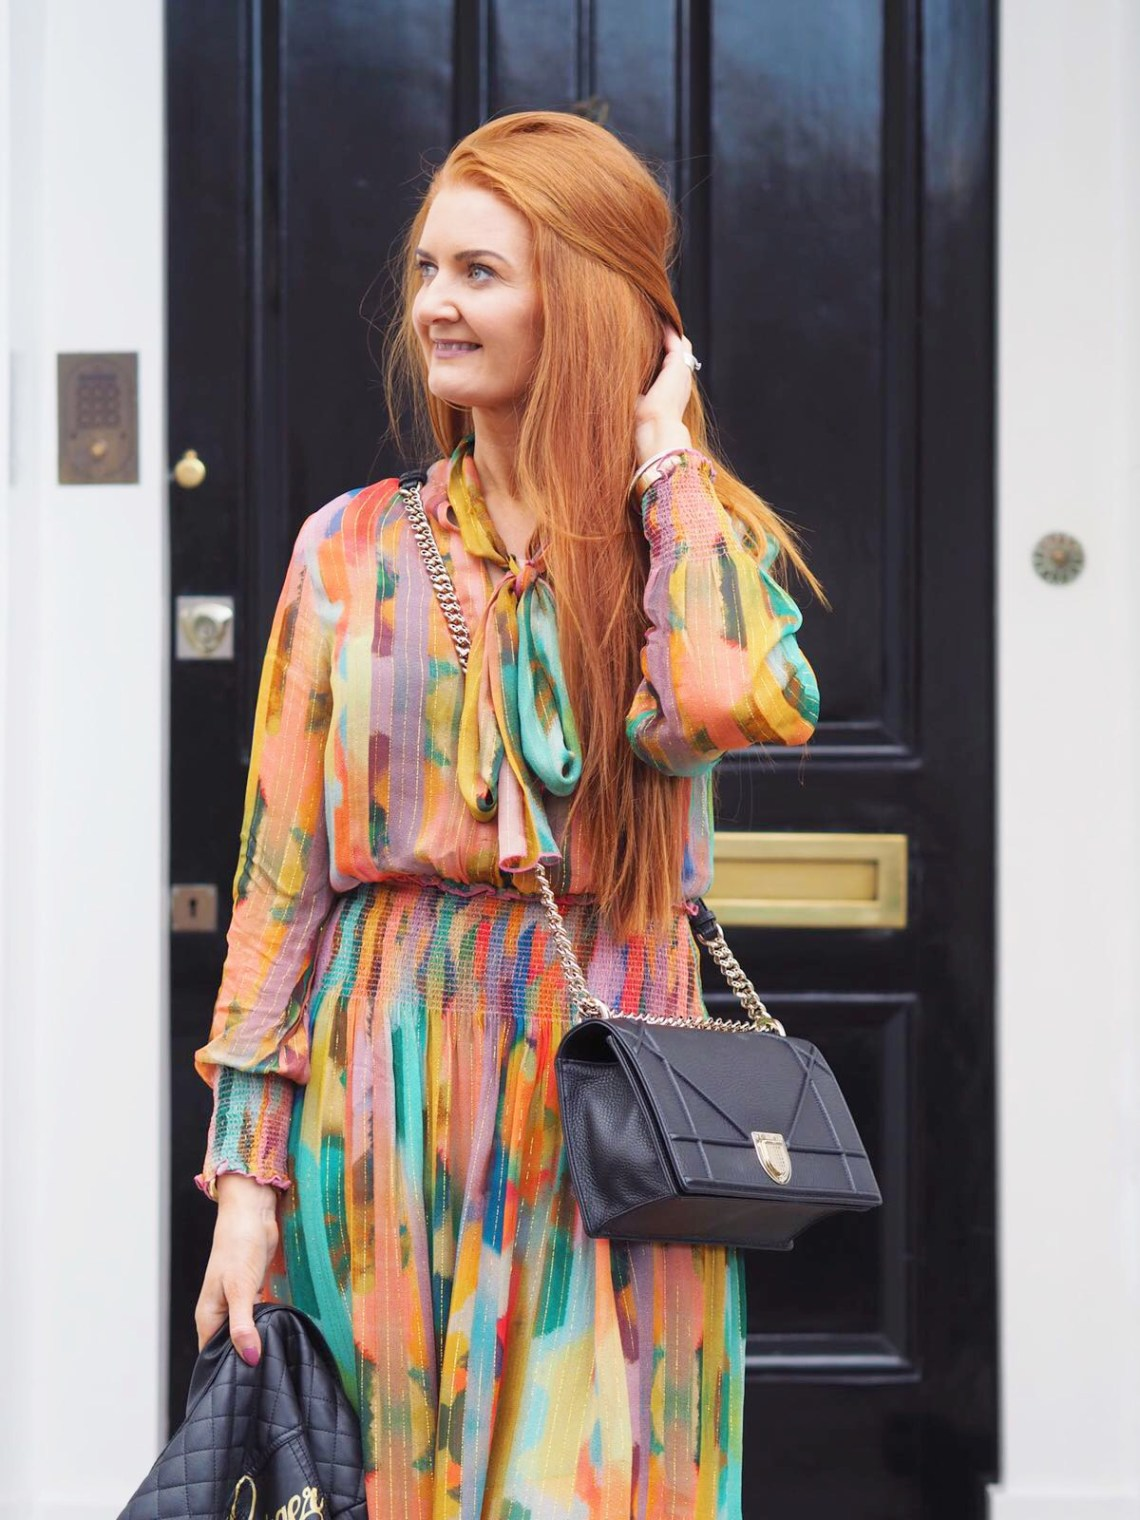 Anthropologie Meja Dress - Rainbows For Spring/Summer